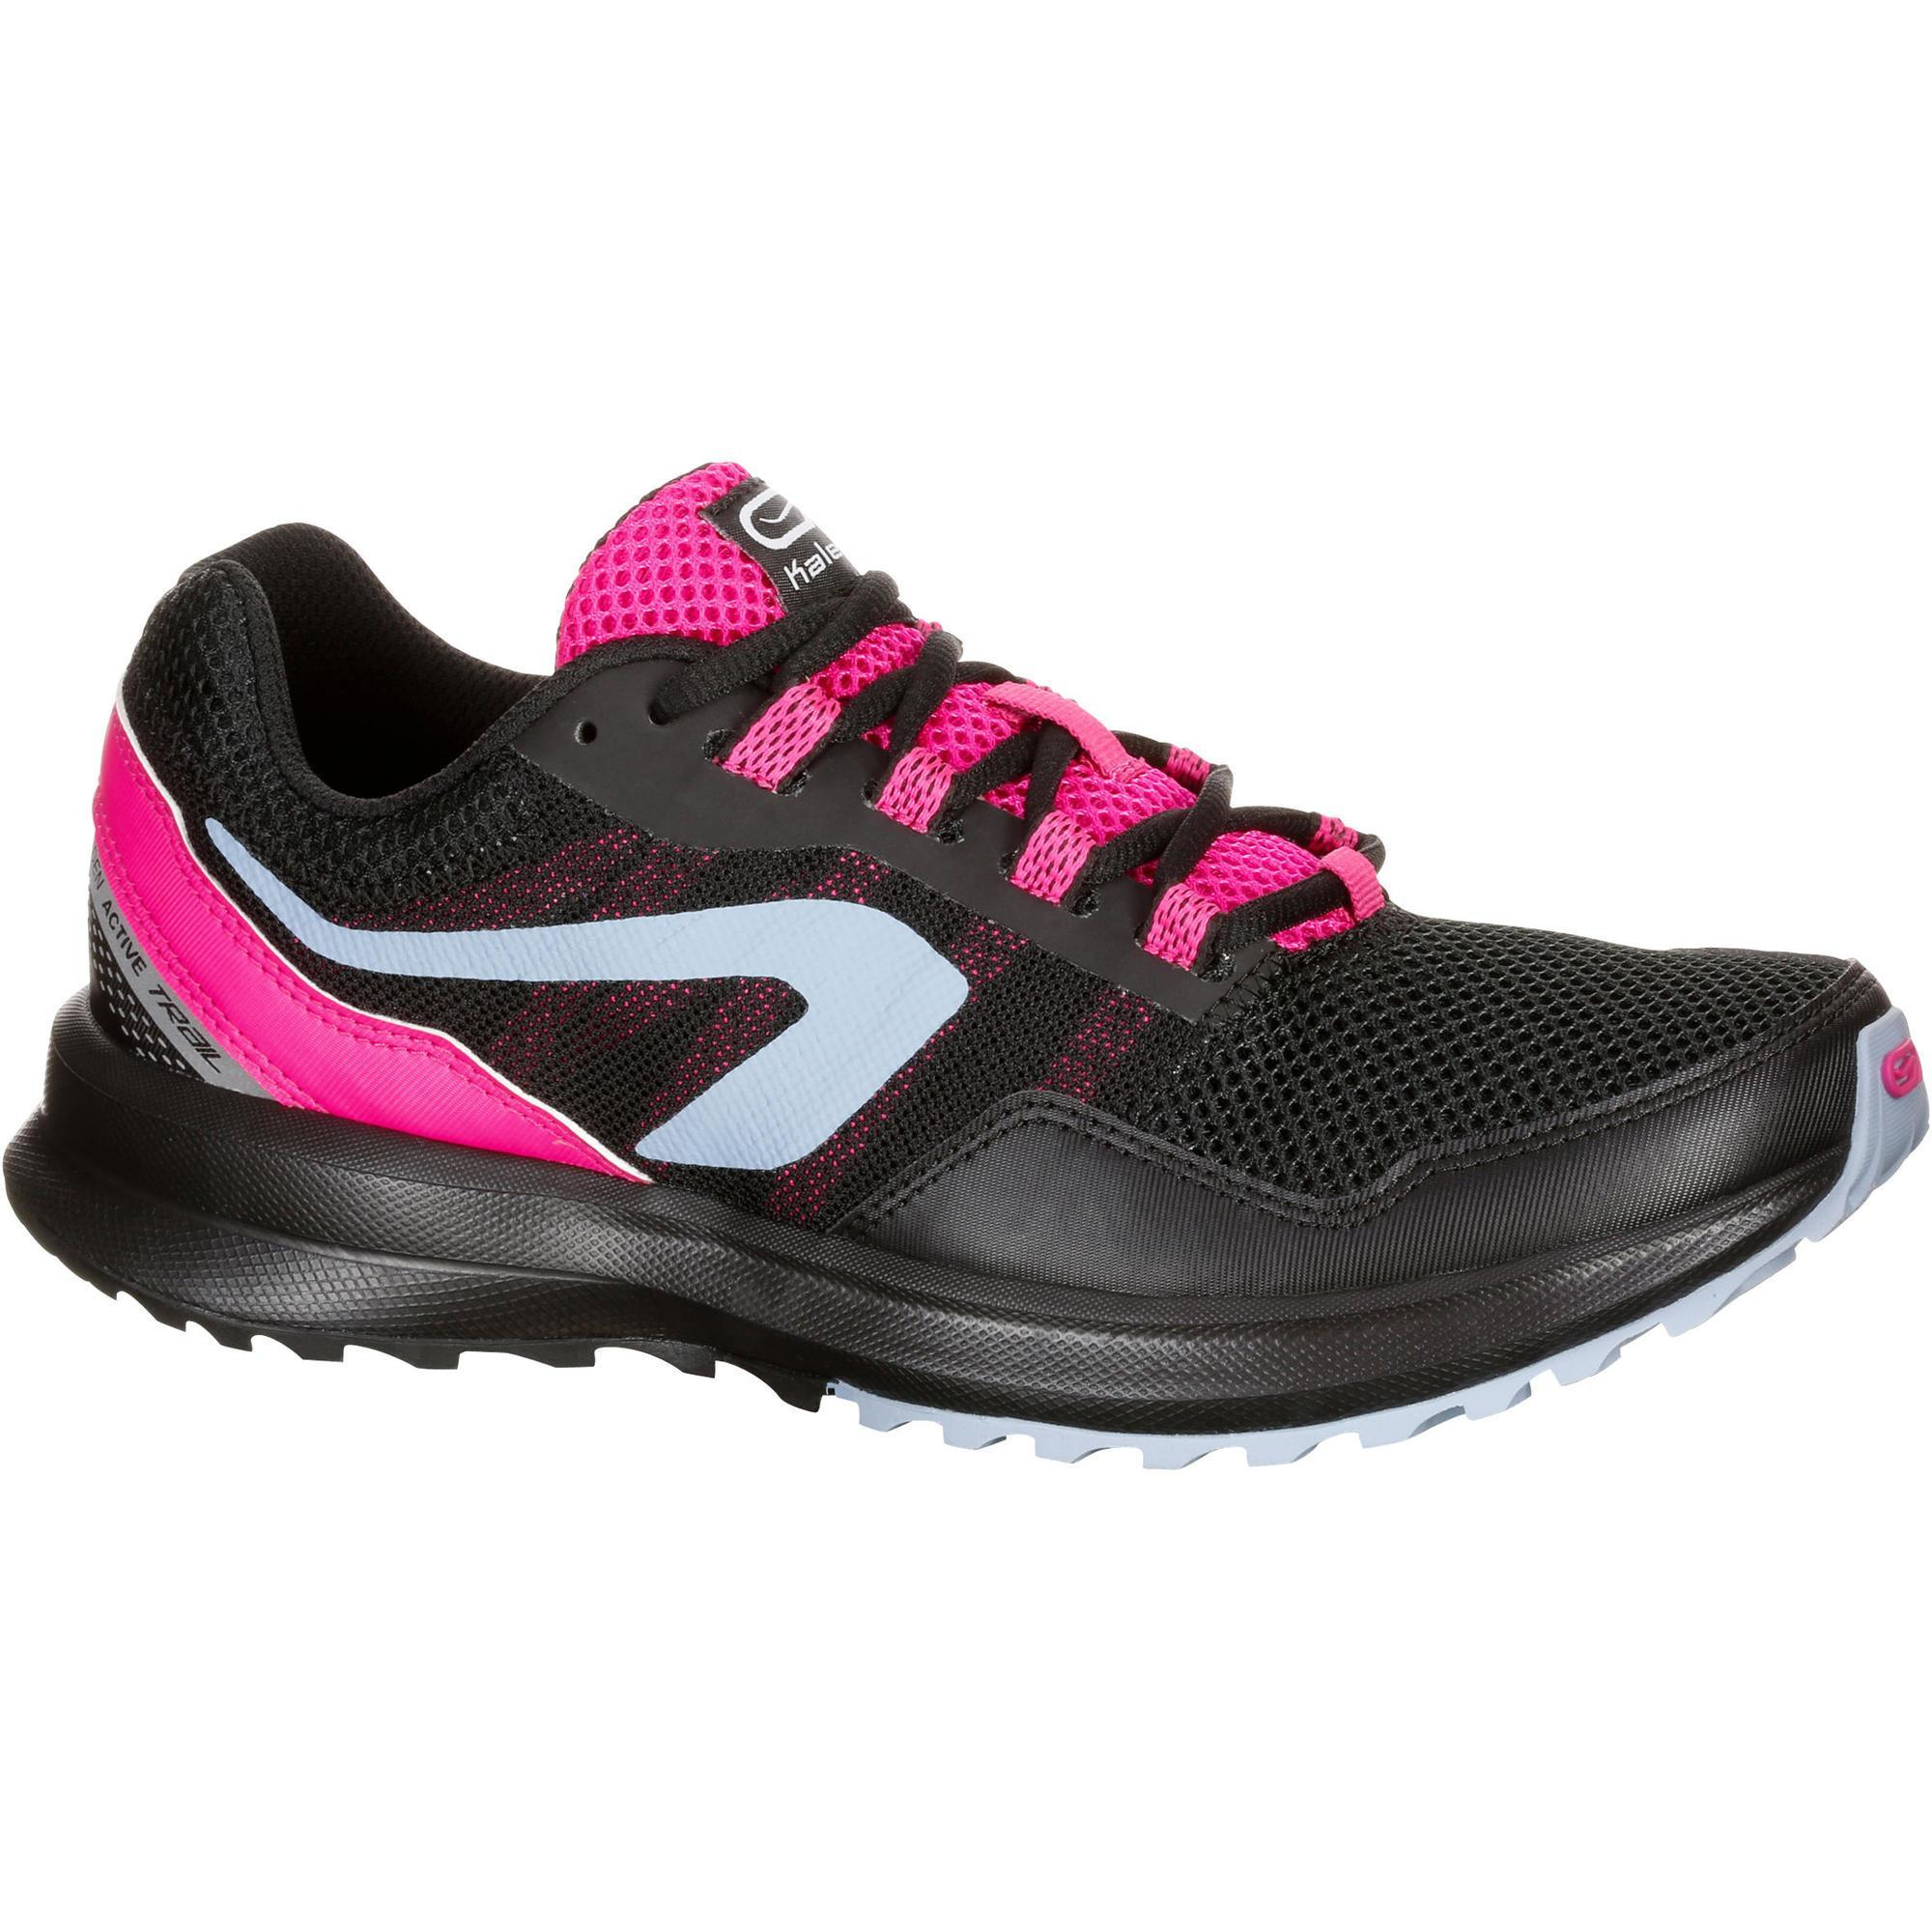 Kalenji Joggingschoenen dames Run Active Grip